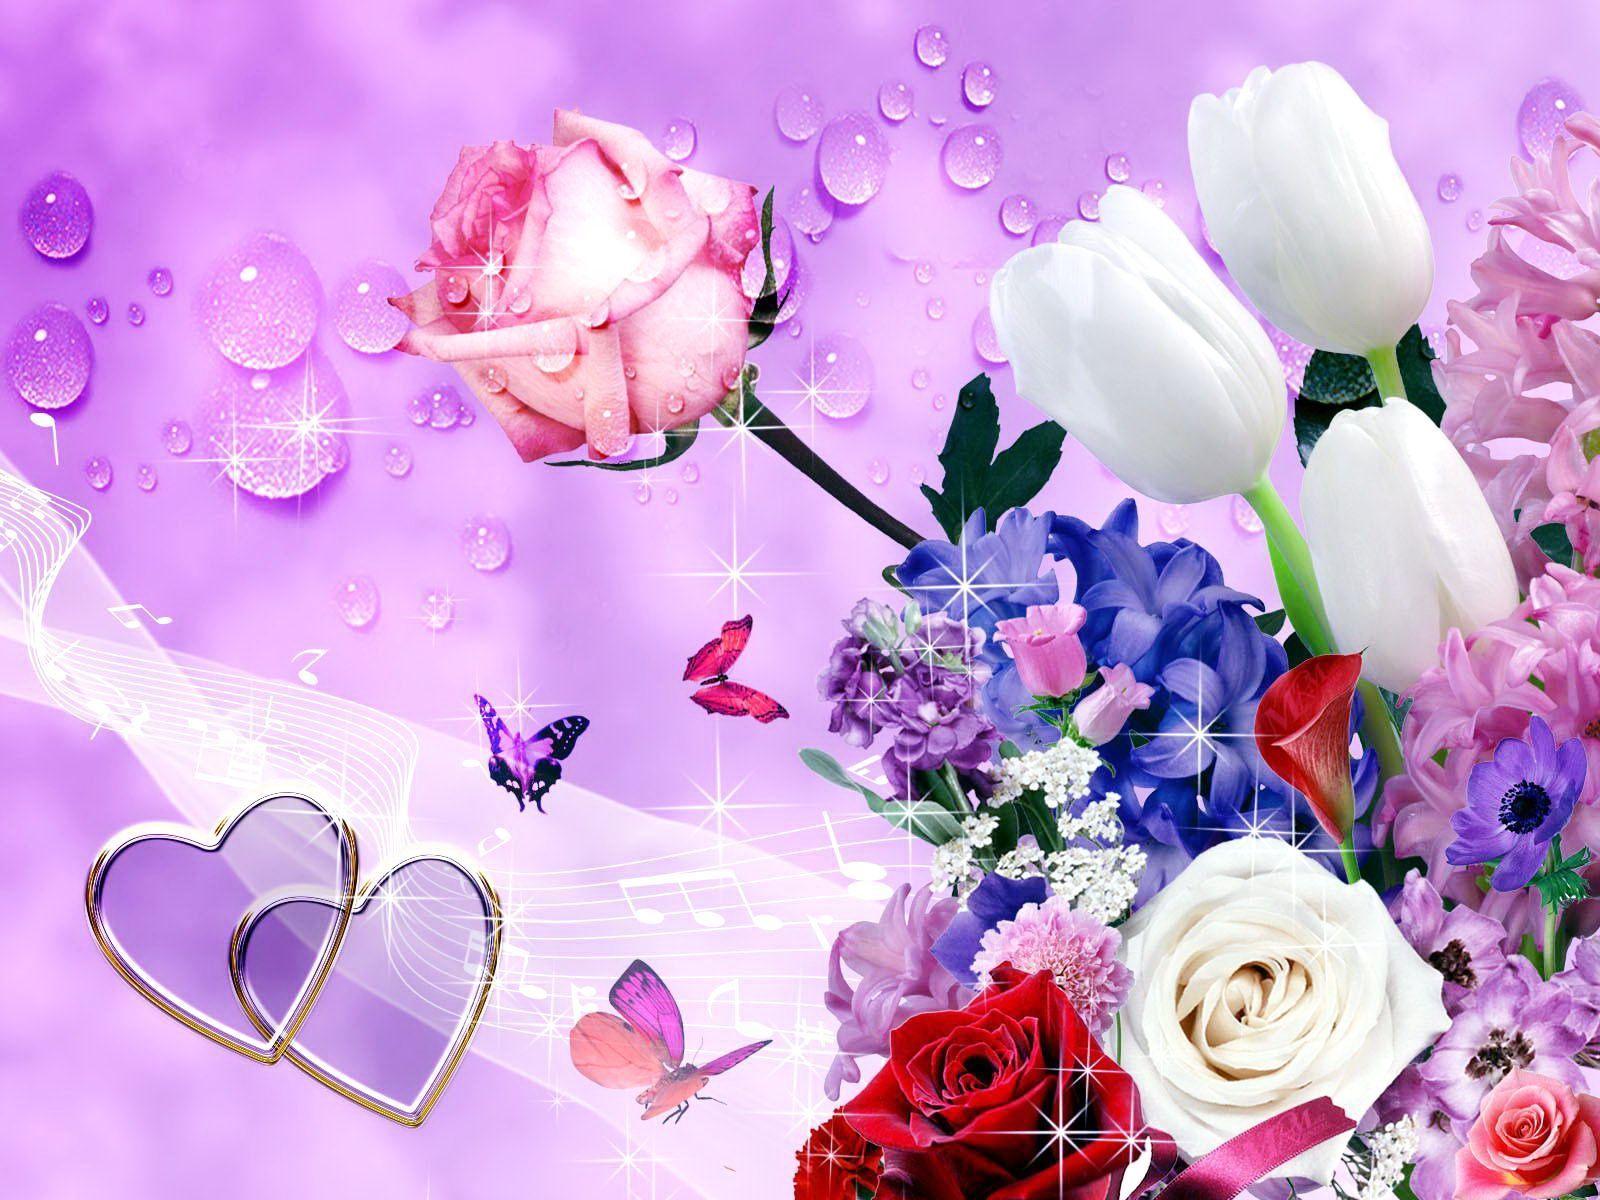 Pink rose wallpaper free free wallpaper download 19201282 beautiful pink rose wallpaper free free wallpaper download 19201282 beautiful pink roses wallpapers 47 wallpapers adorable wallpapers izmirmasajfo